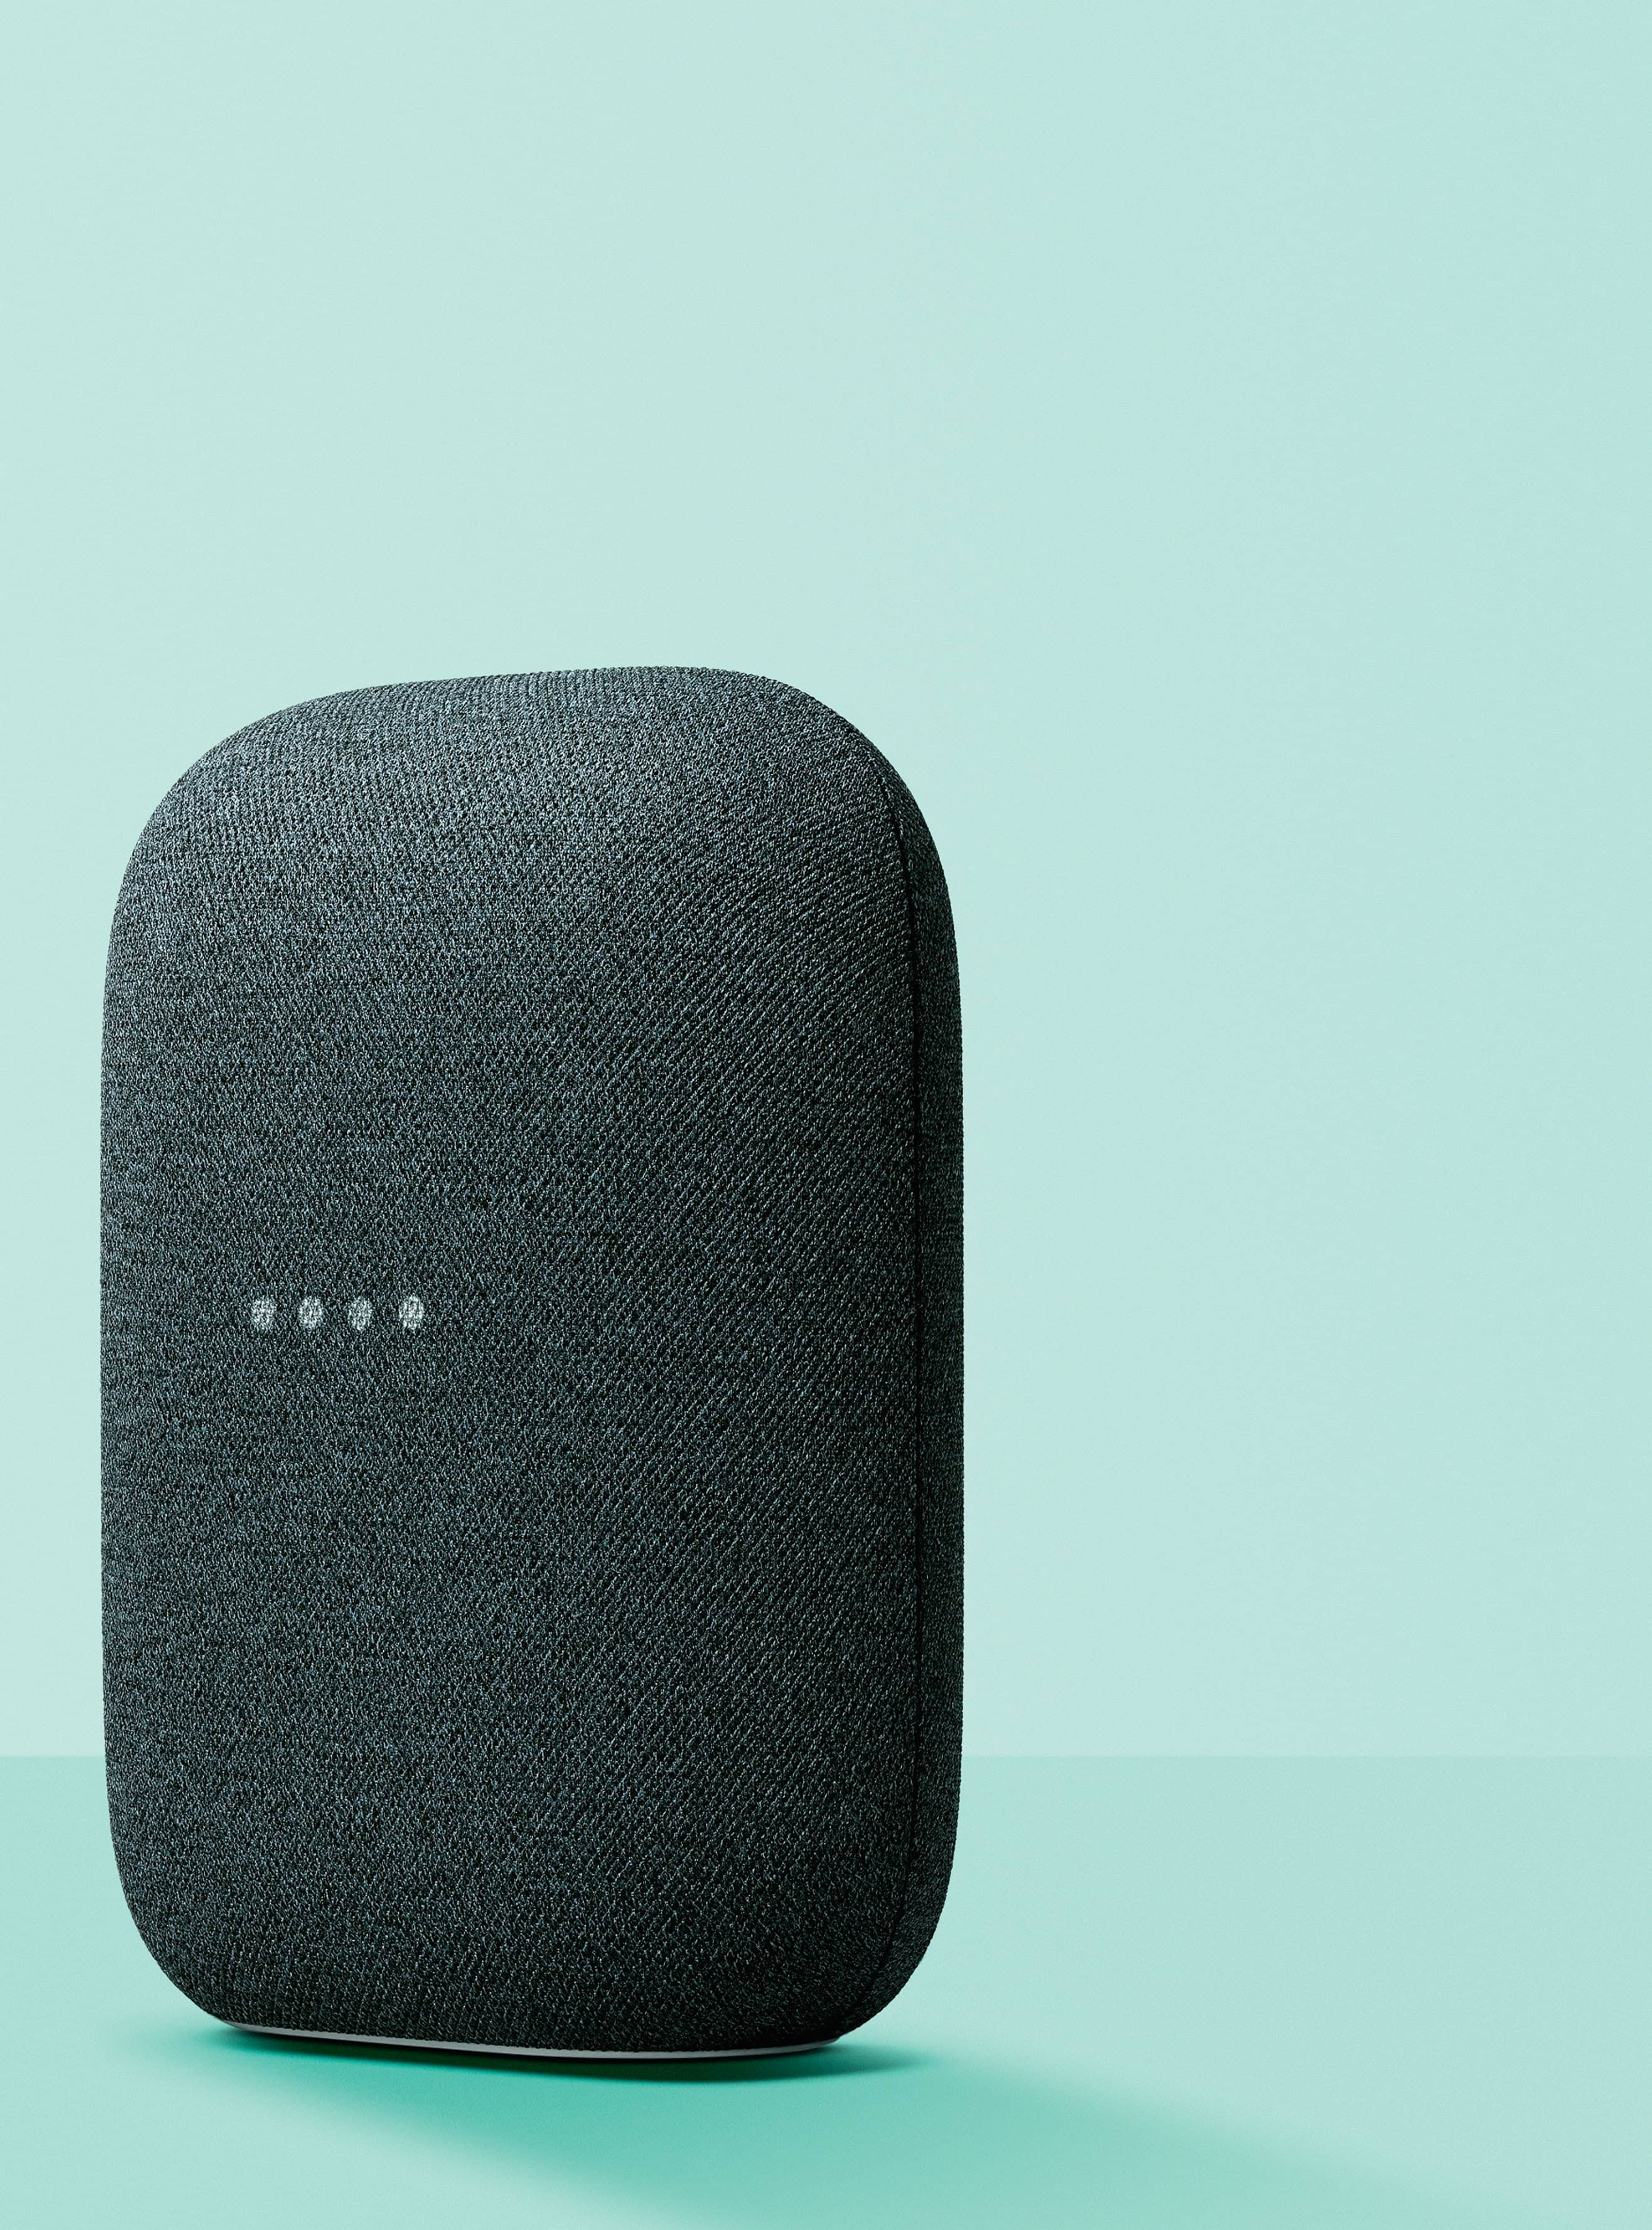 Simply The Nest - Google Nest Audio